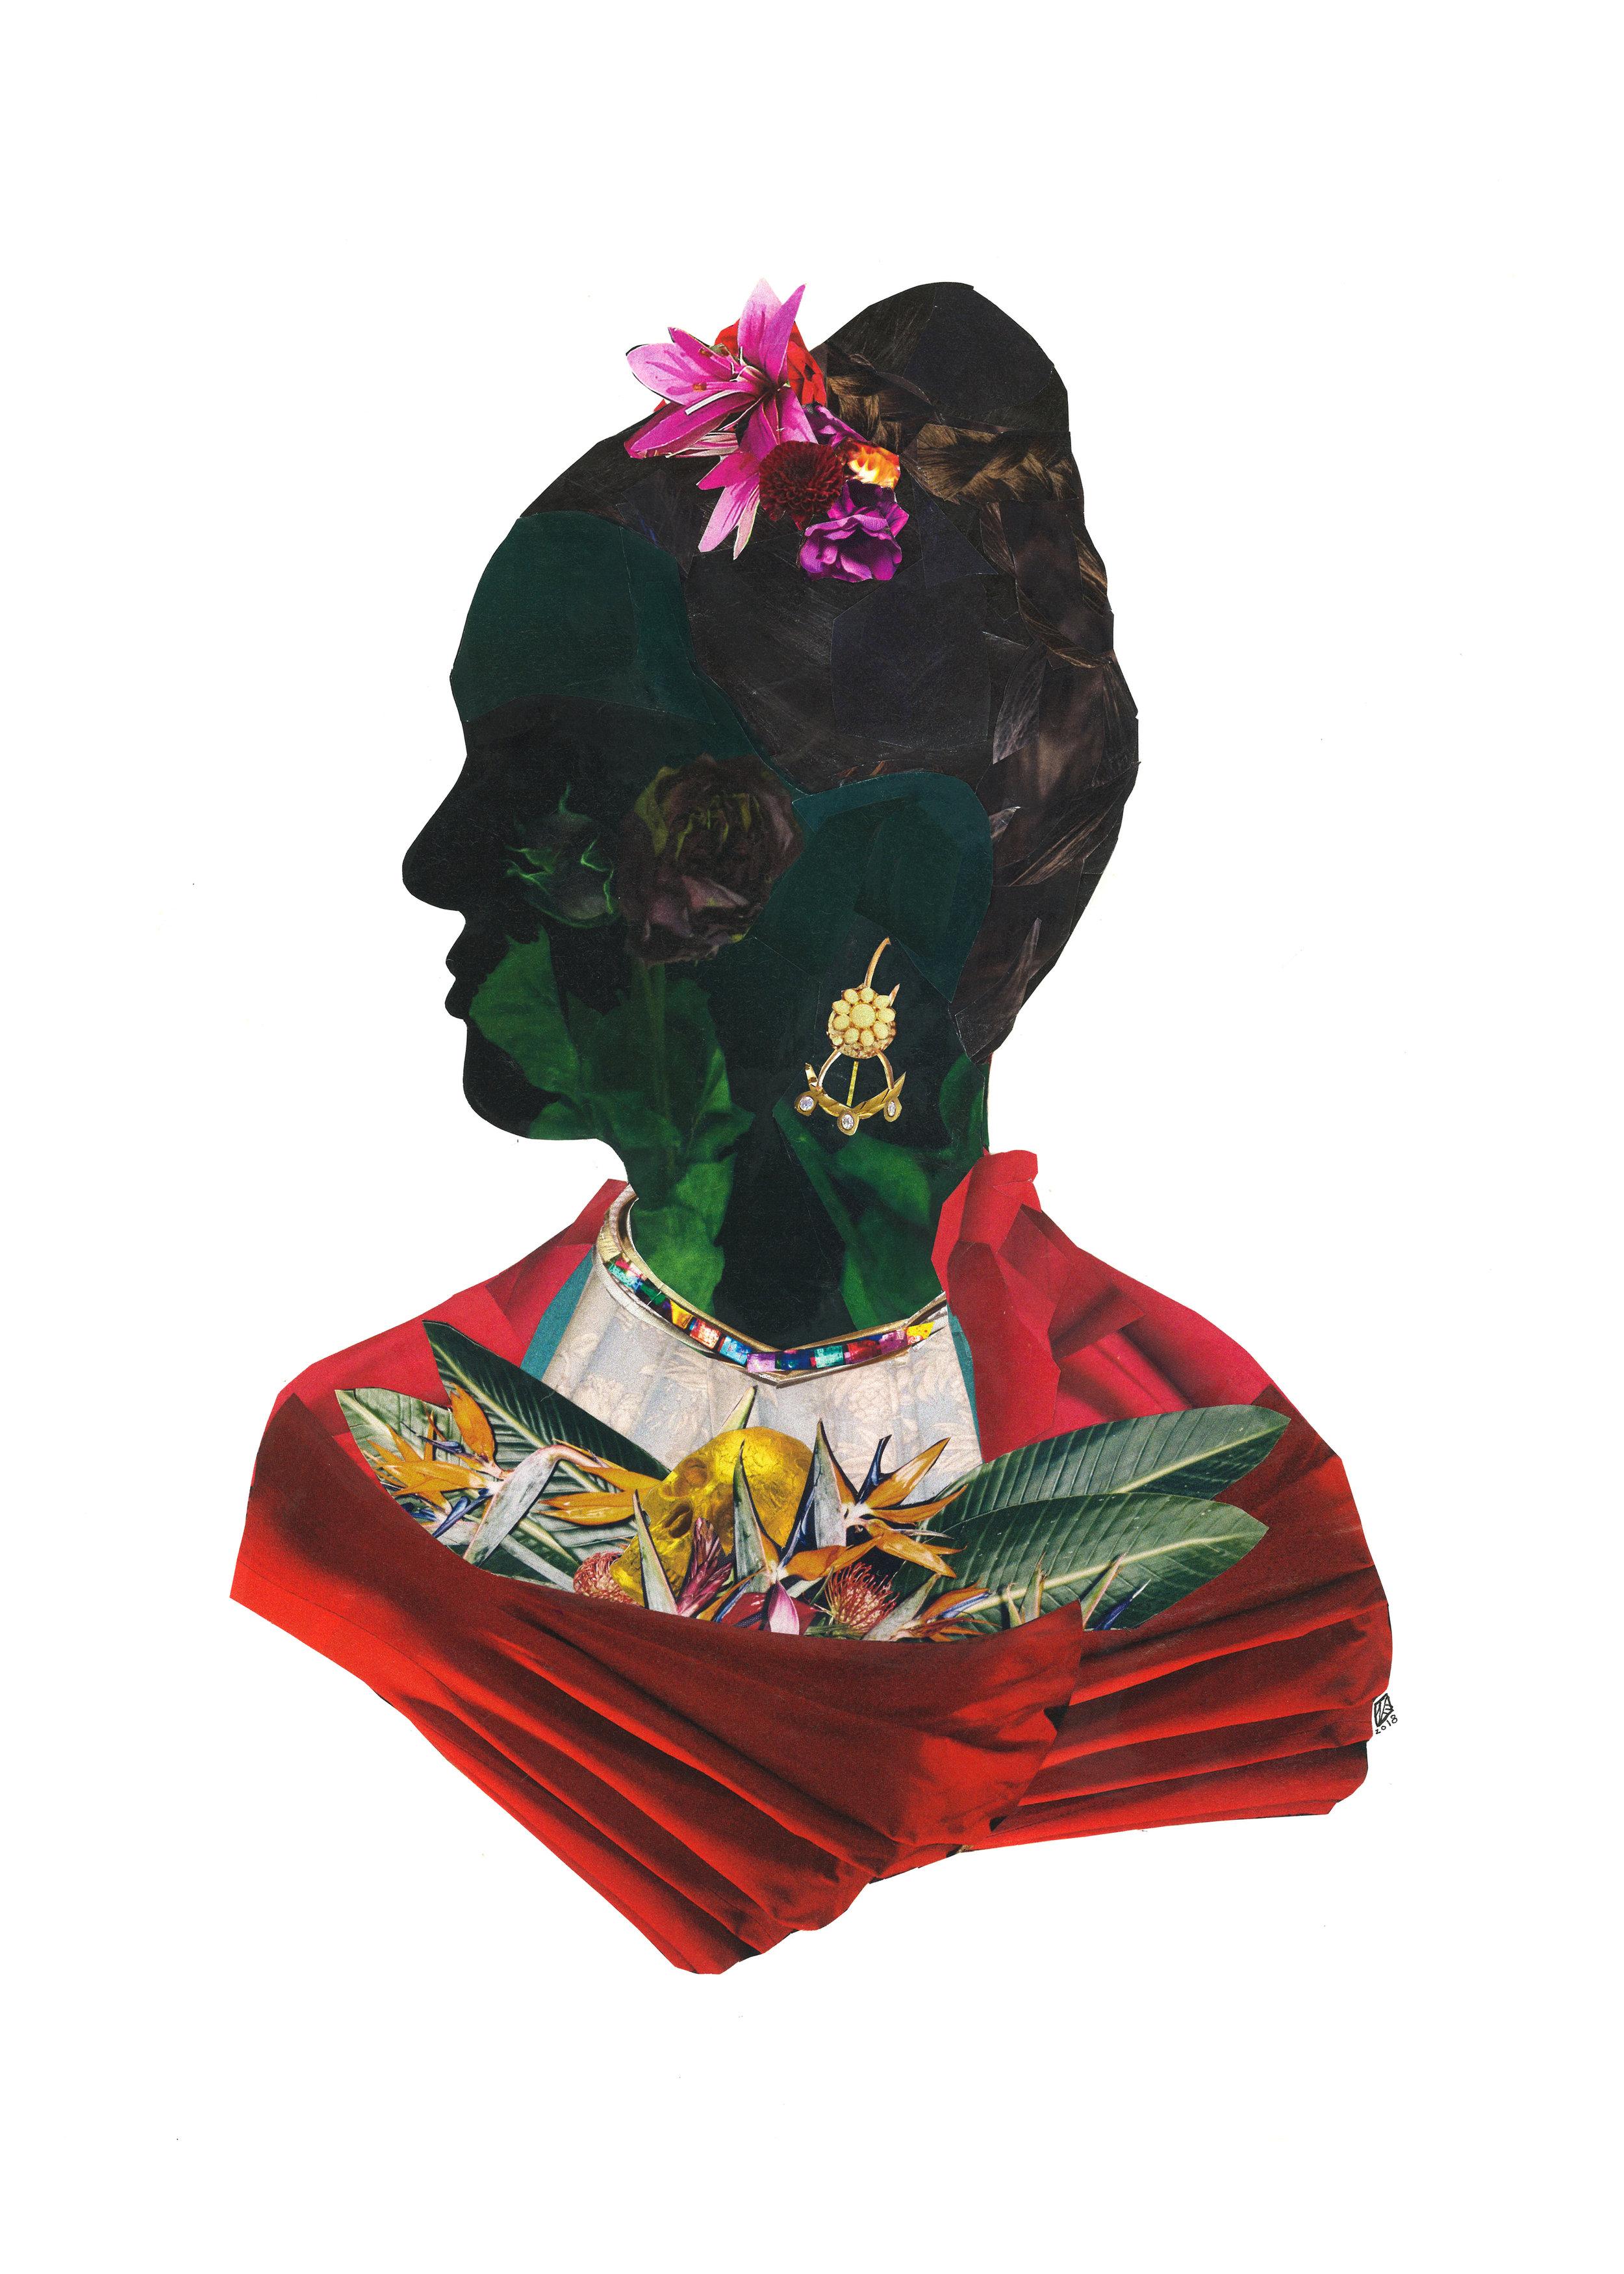 La Heroina Del Dolor, Frida, 11x14, 2018